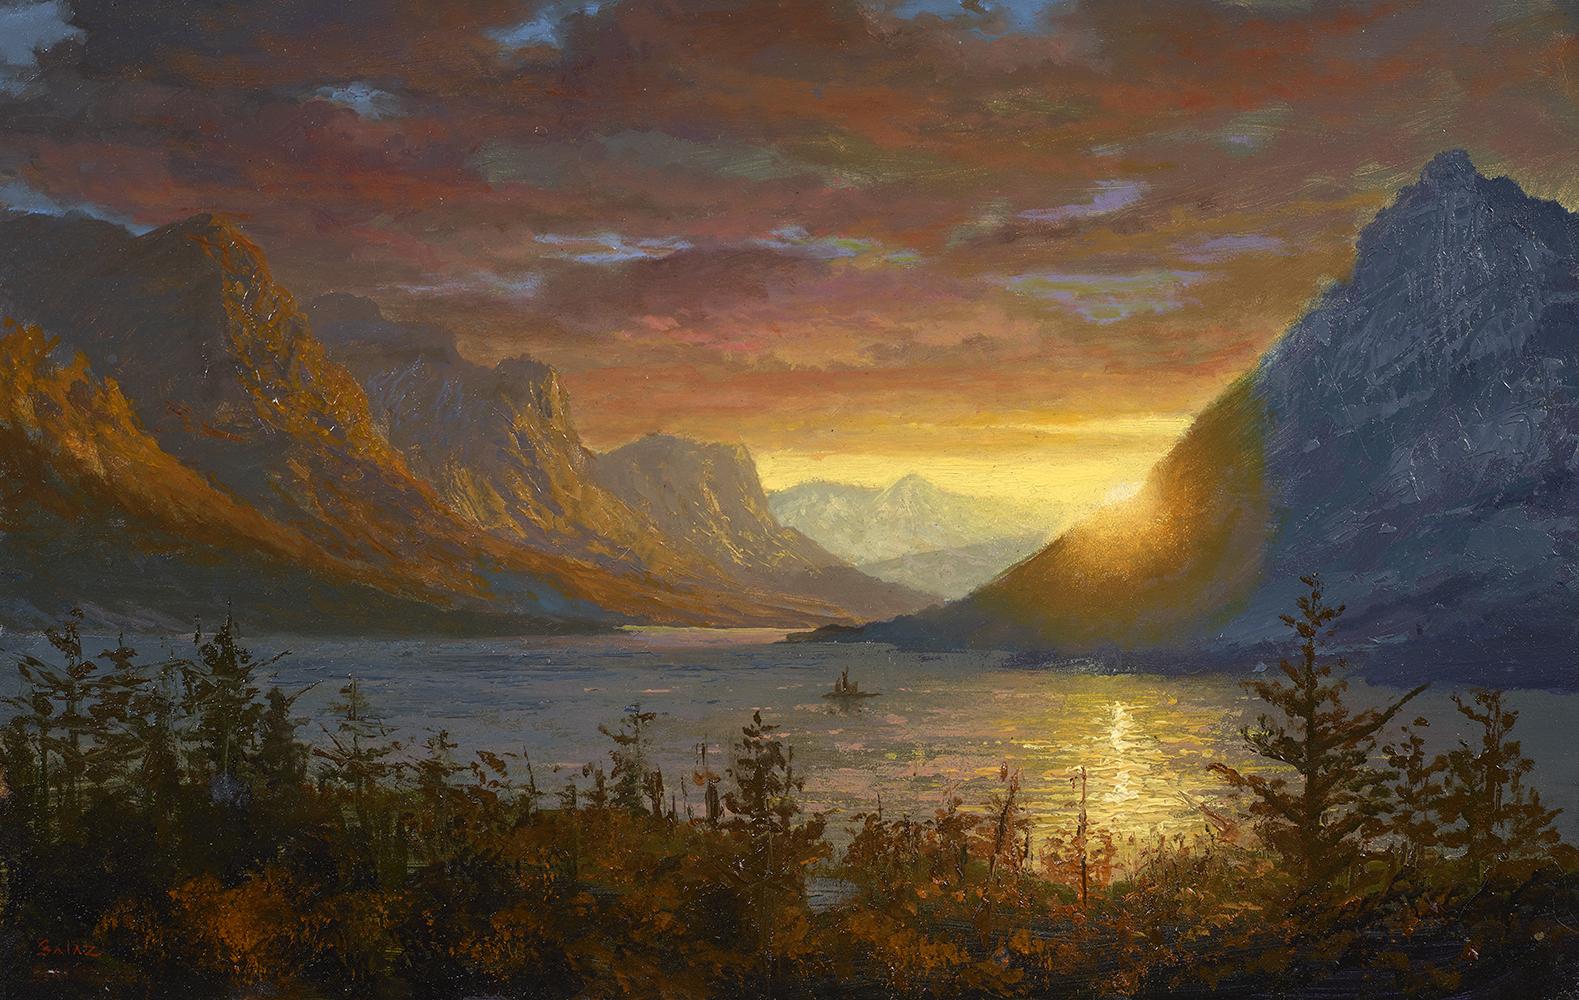 ken_salaz_kws1102_st_marys_lake_montana.jpg